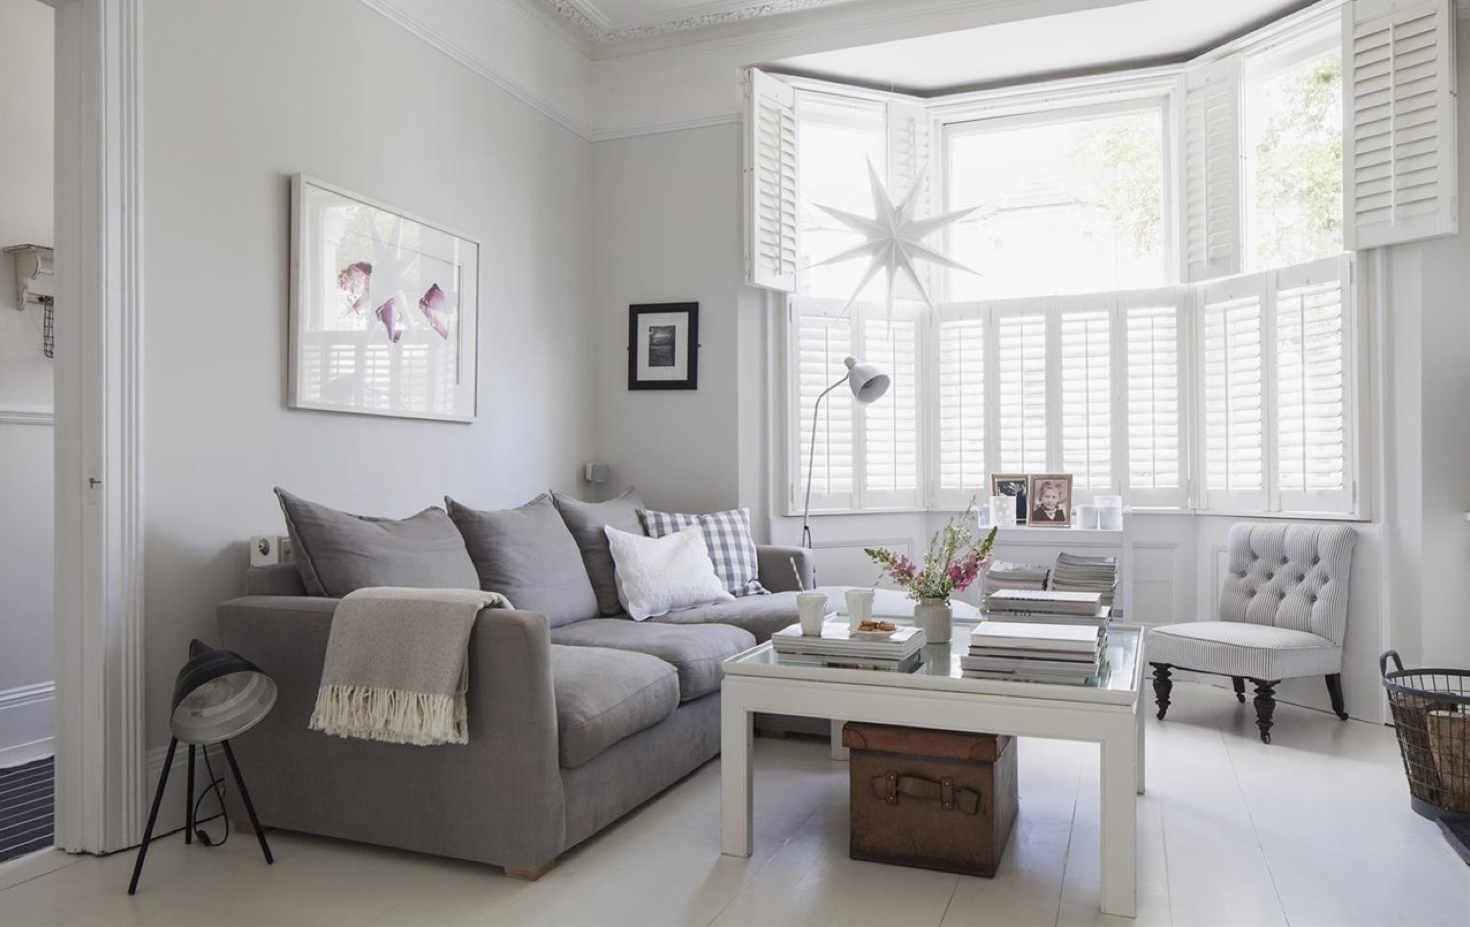 Living Room Ideas Light Grey Sofa Deep Purple Bed Victorian Terrace Sitting Plantation Shutters White